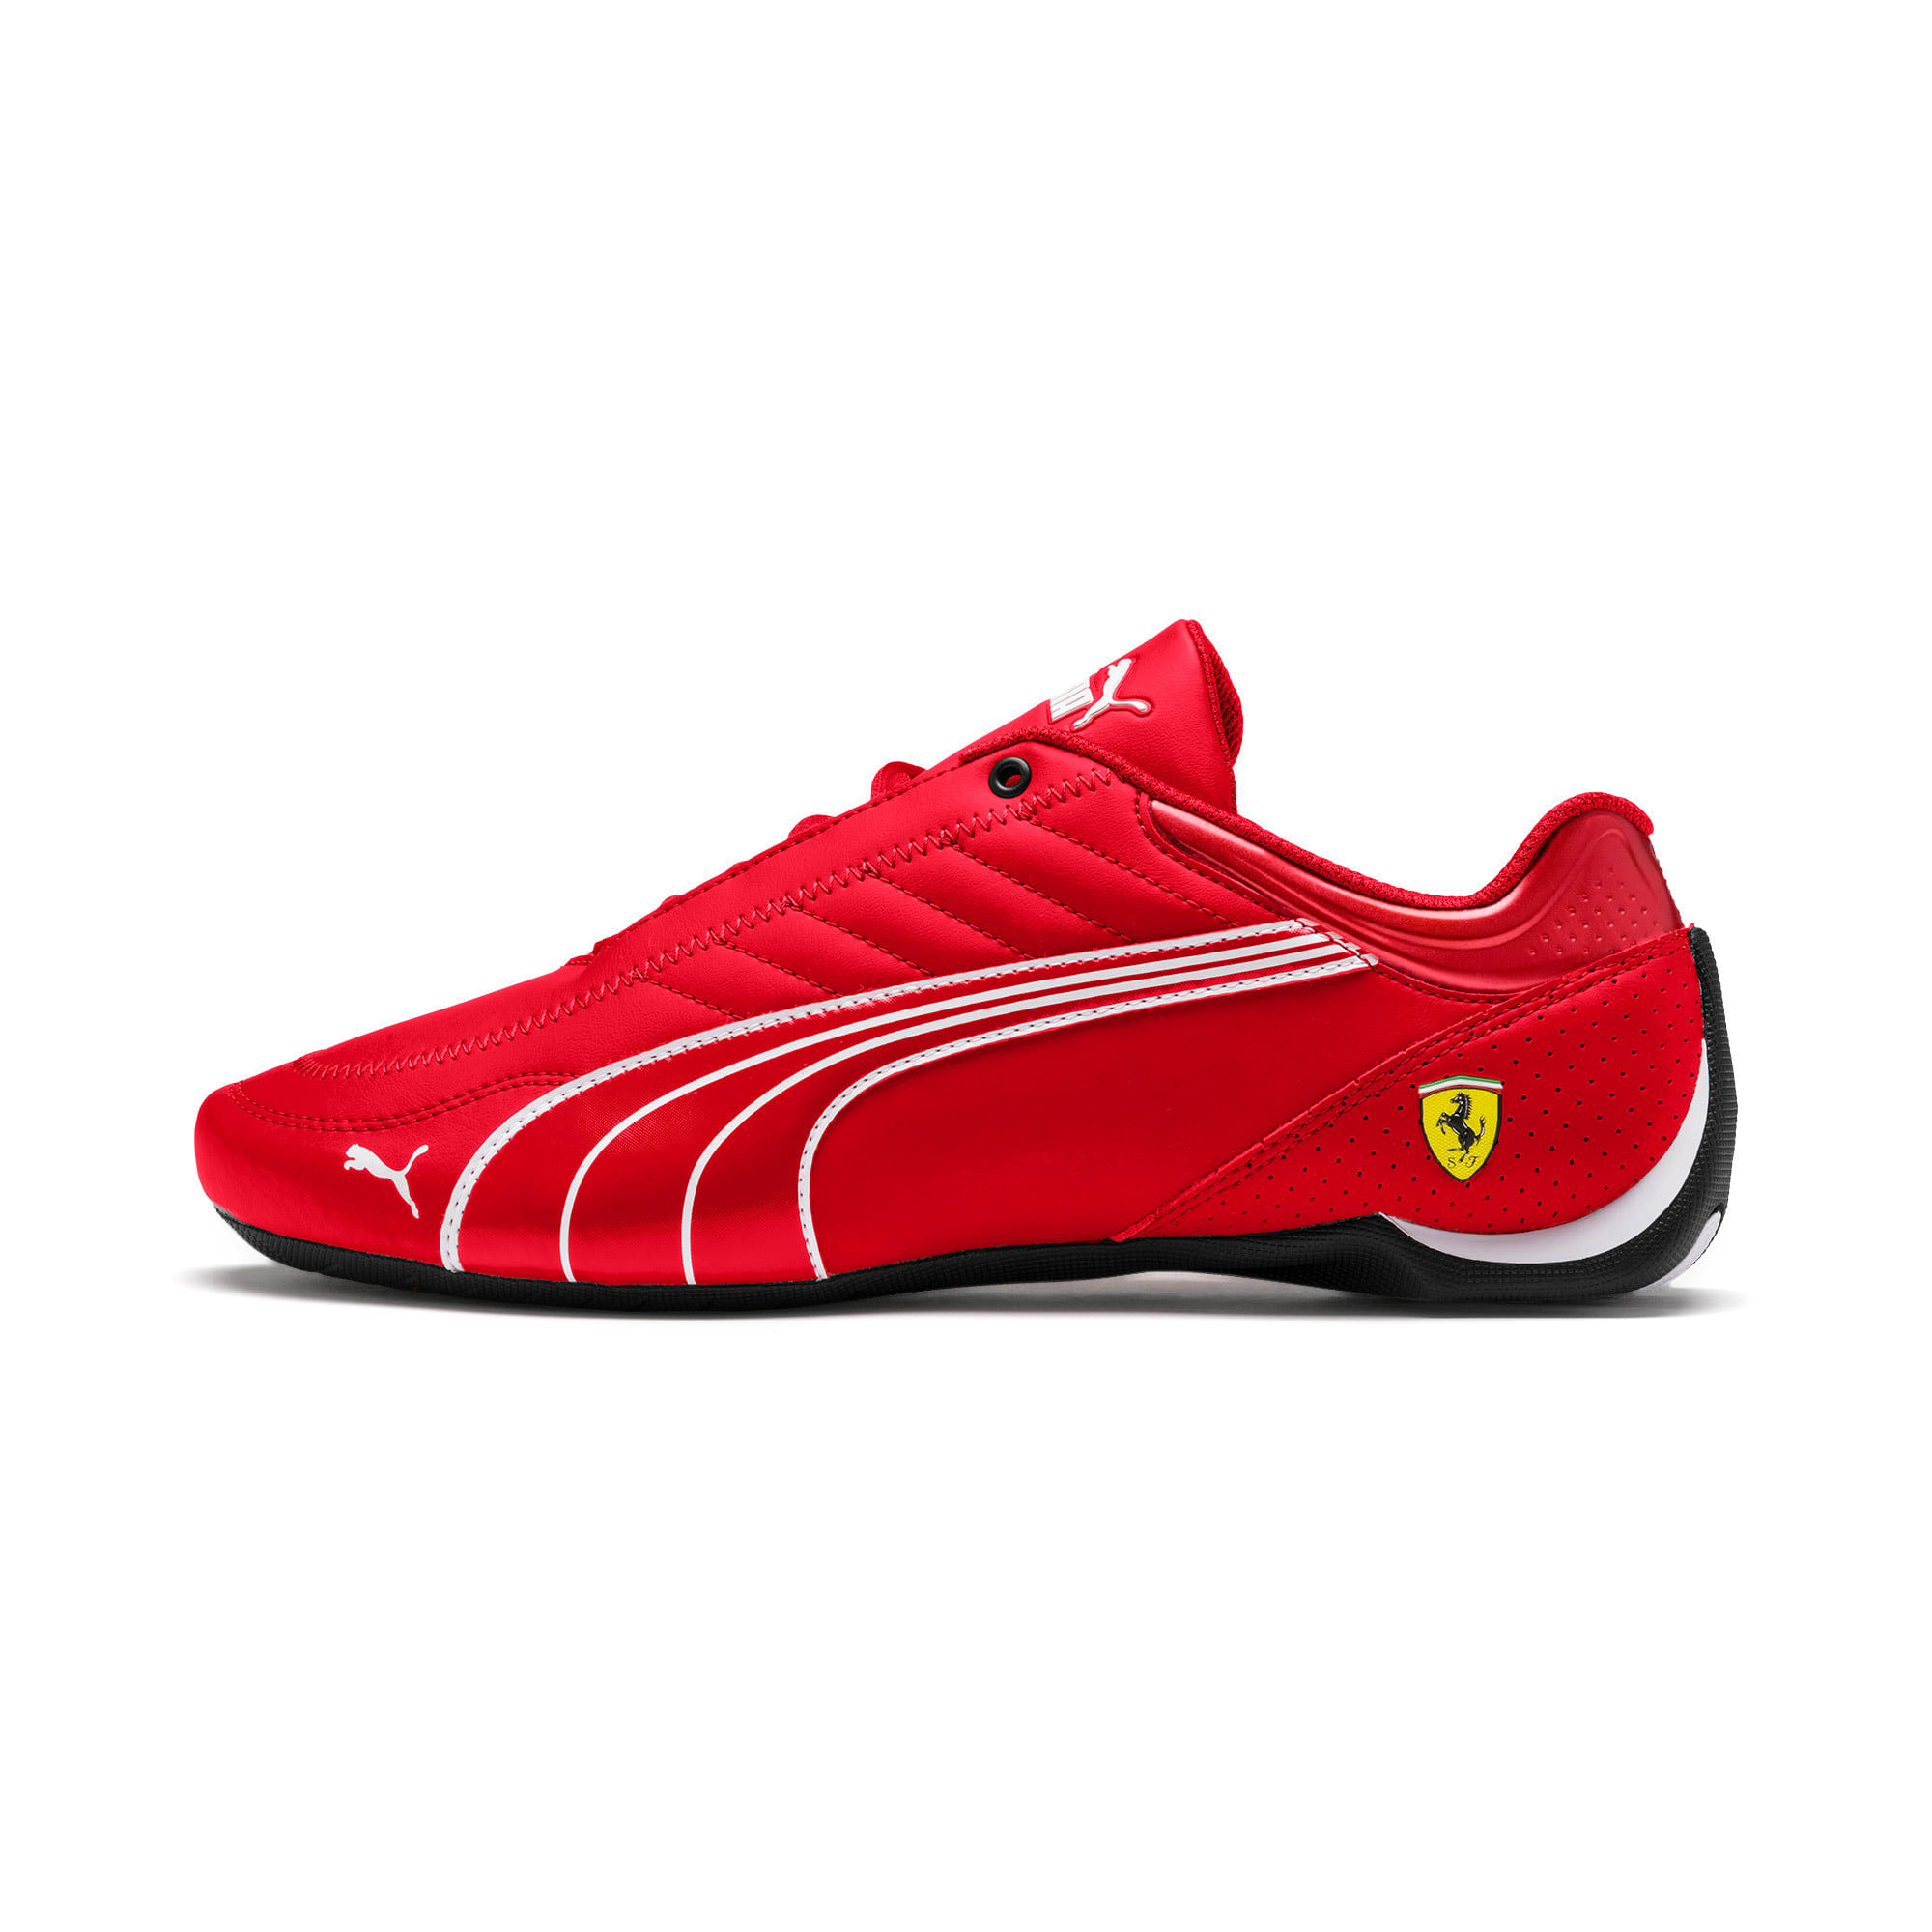 Thumbnail 1 of Ferrari Future Kart Cat Trainers, Rosso Corsa-Puma Black, medium-IND